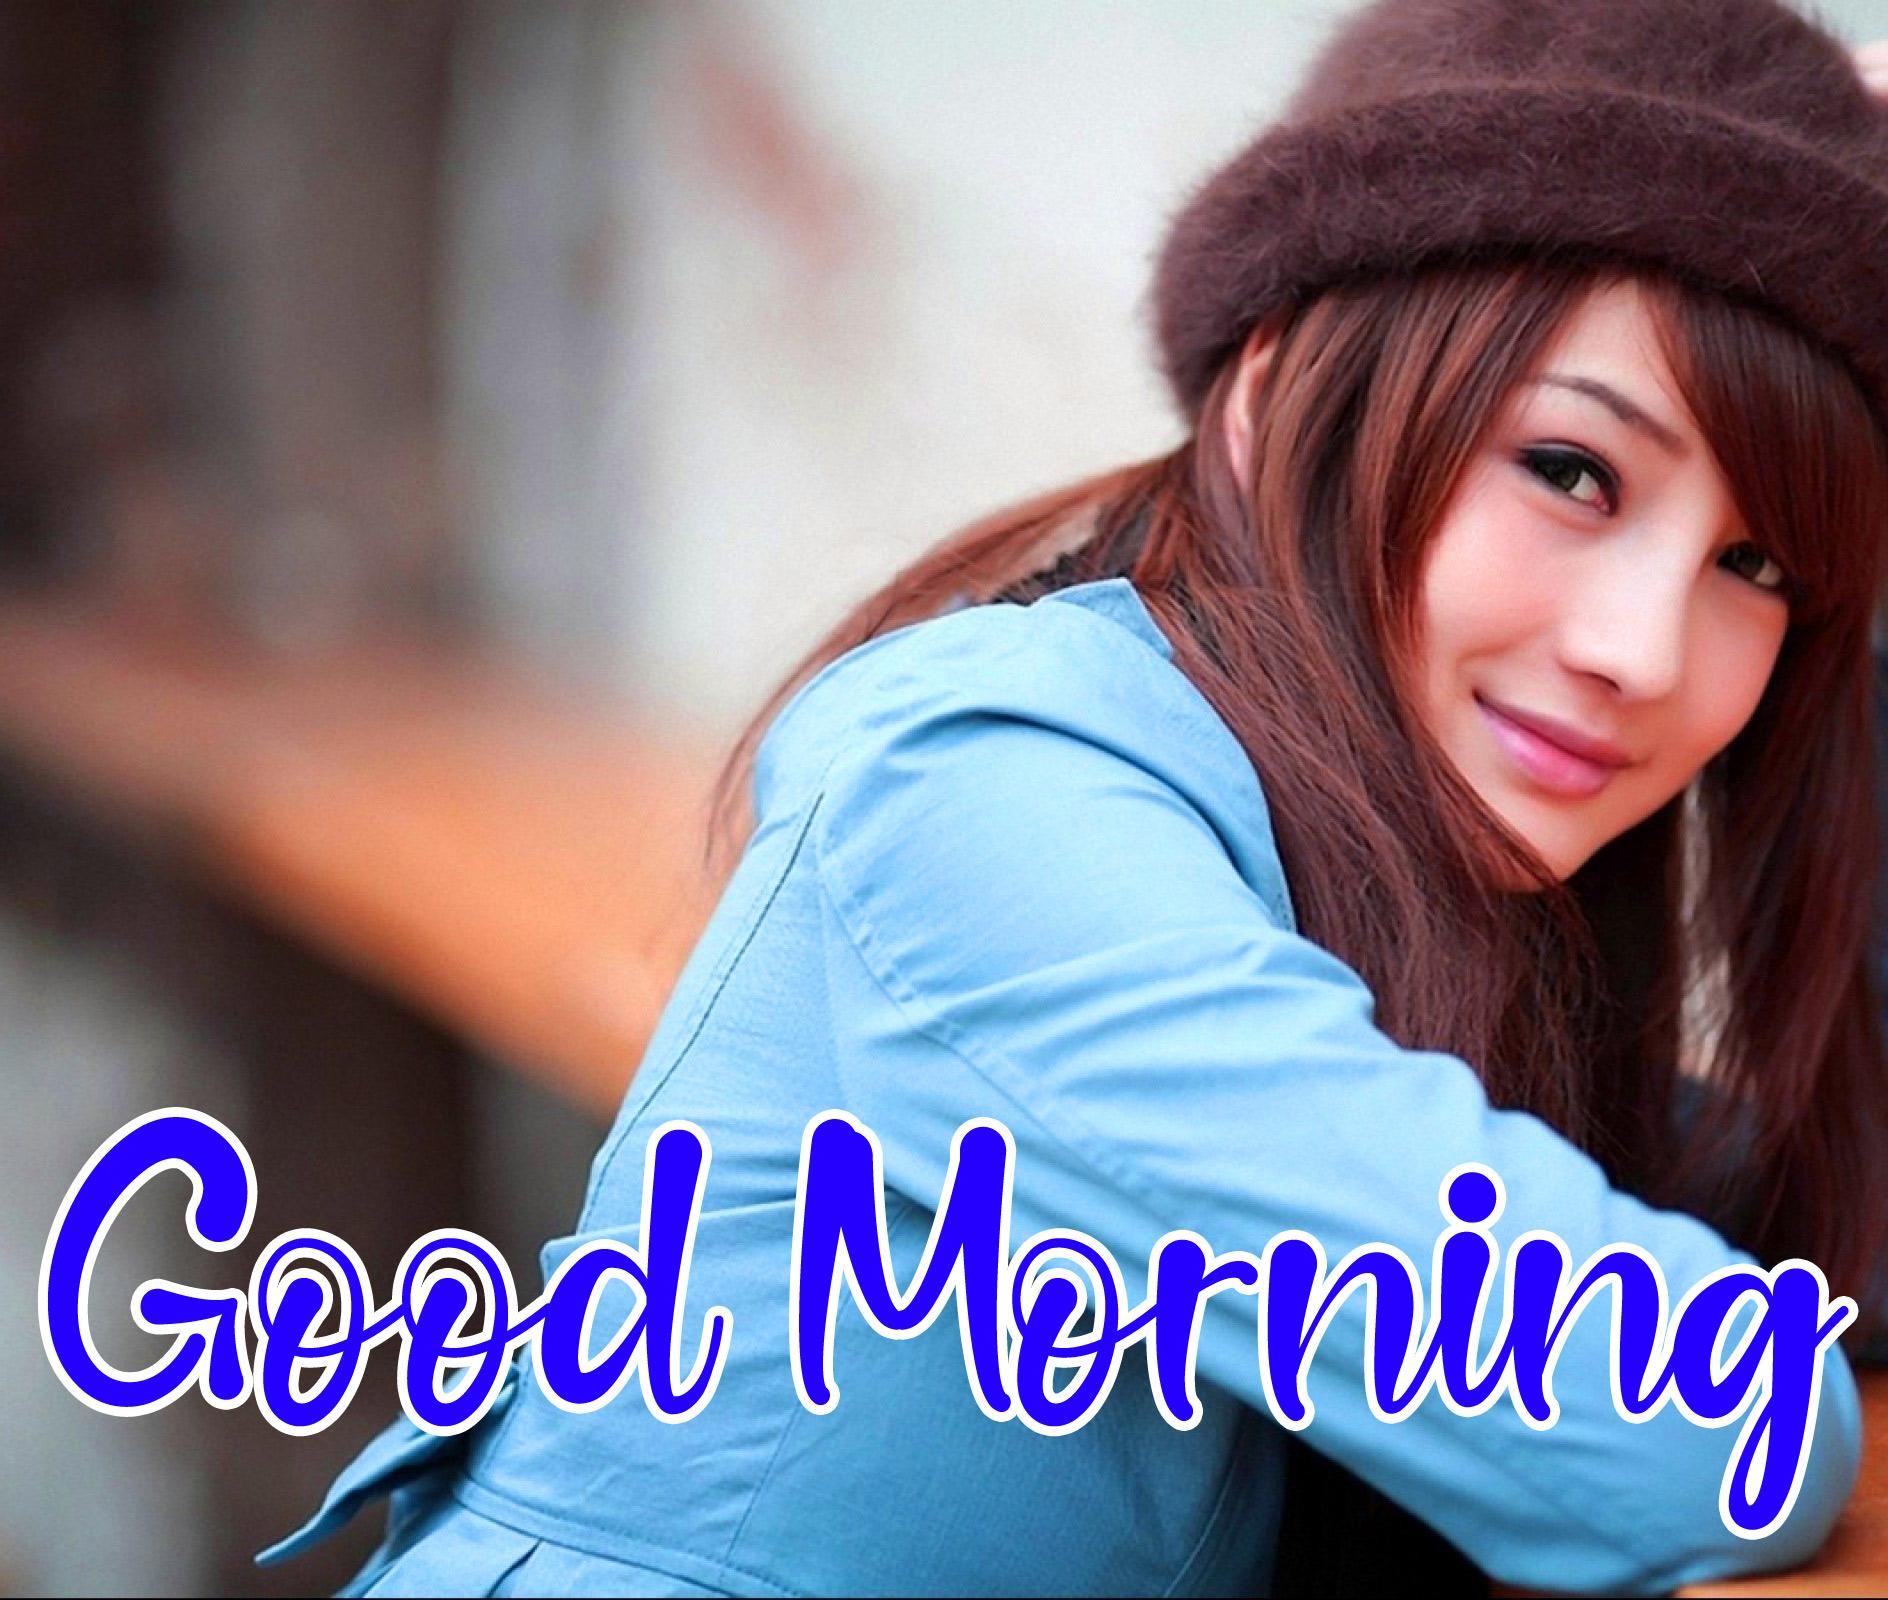 good morning Images for girls 6